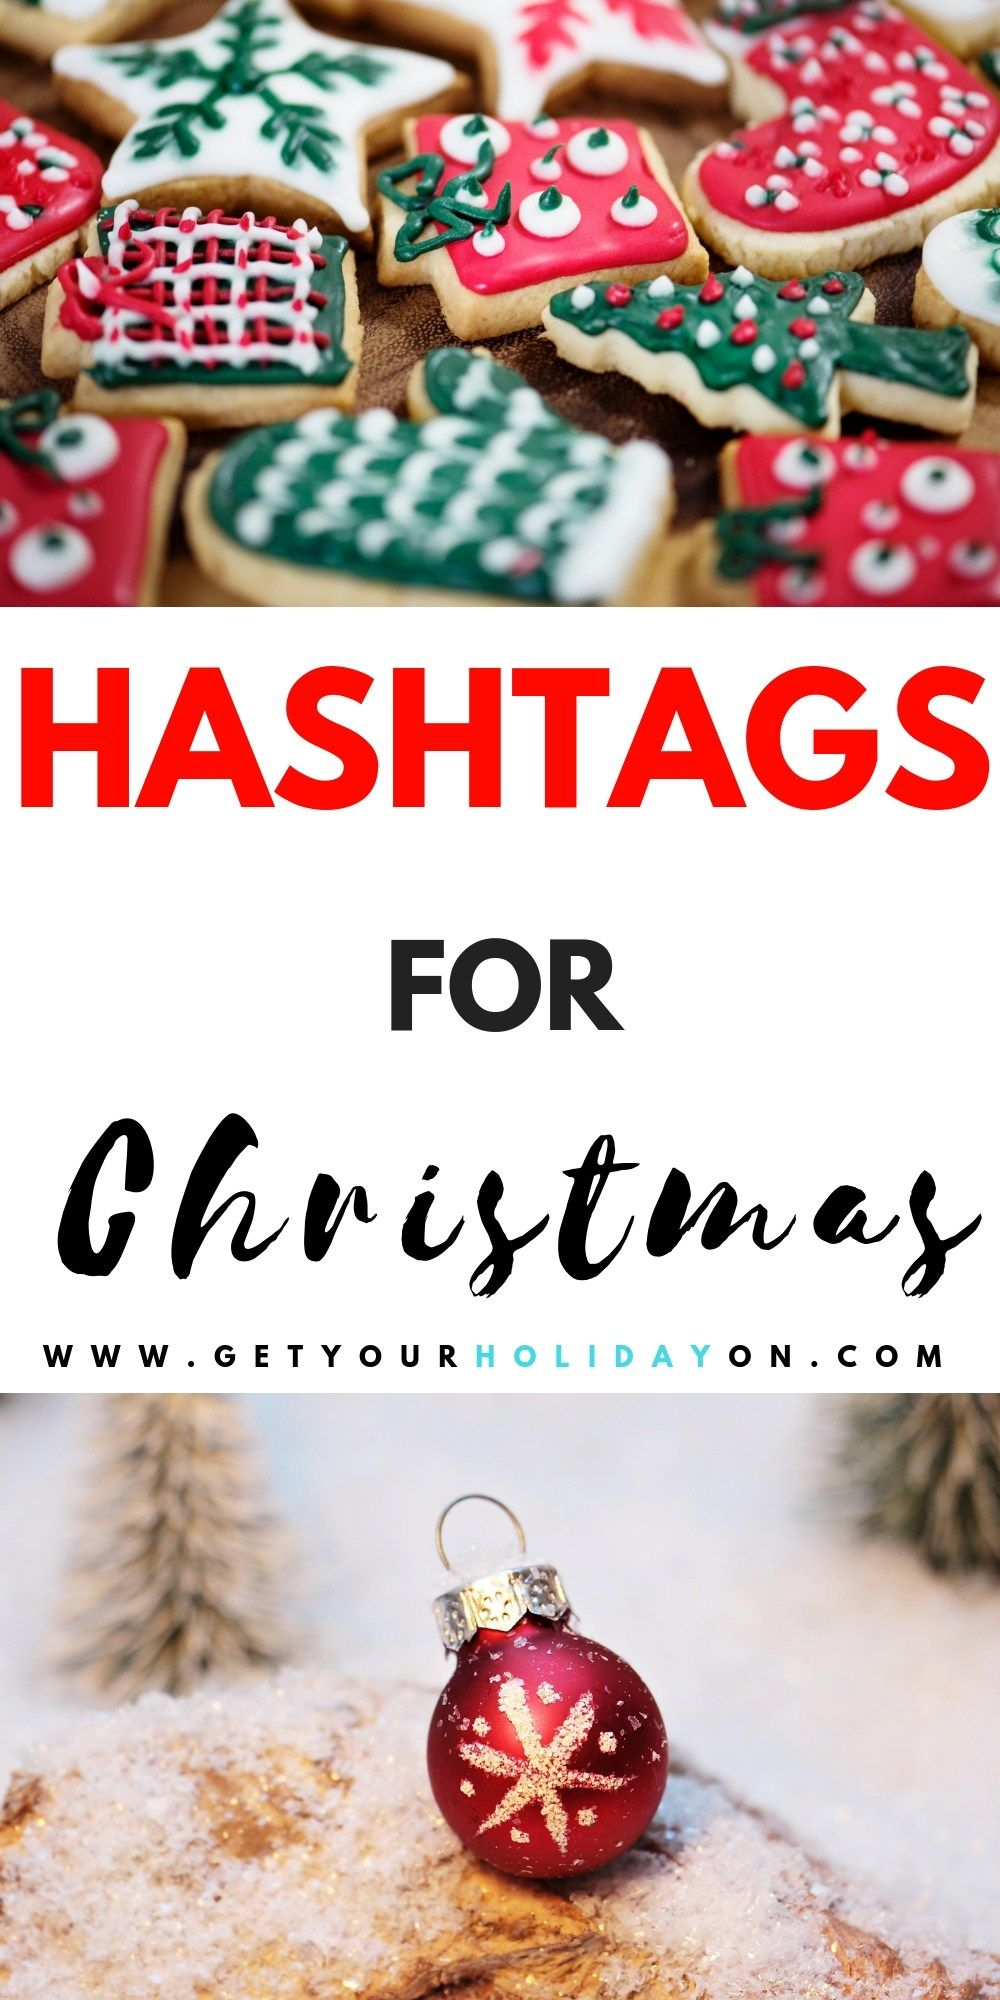 Christmas Hashtags Holiday Hashtags Holiday Diy Holiday Gifts